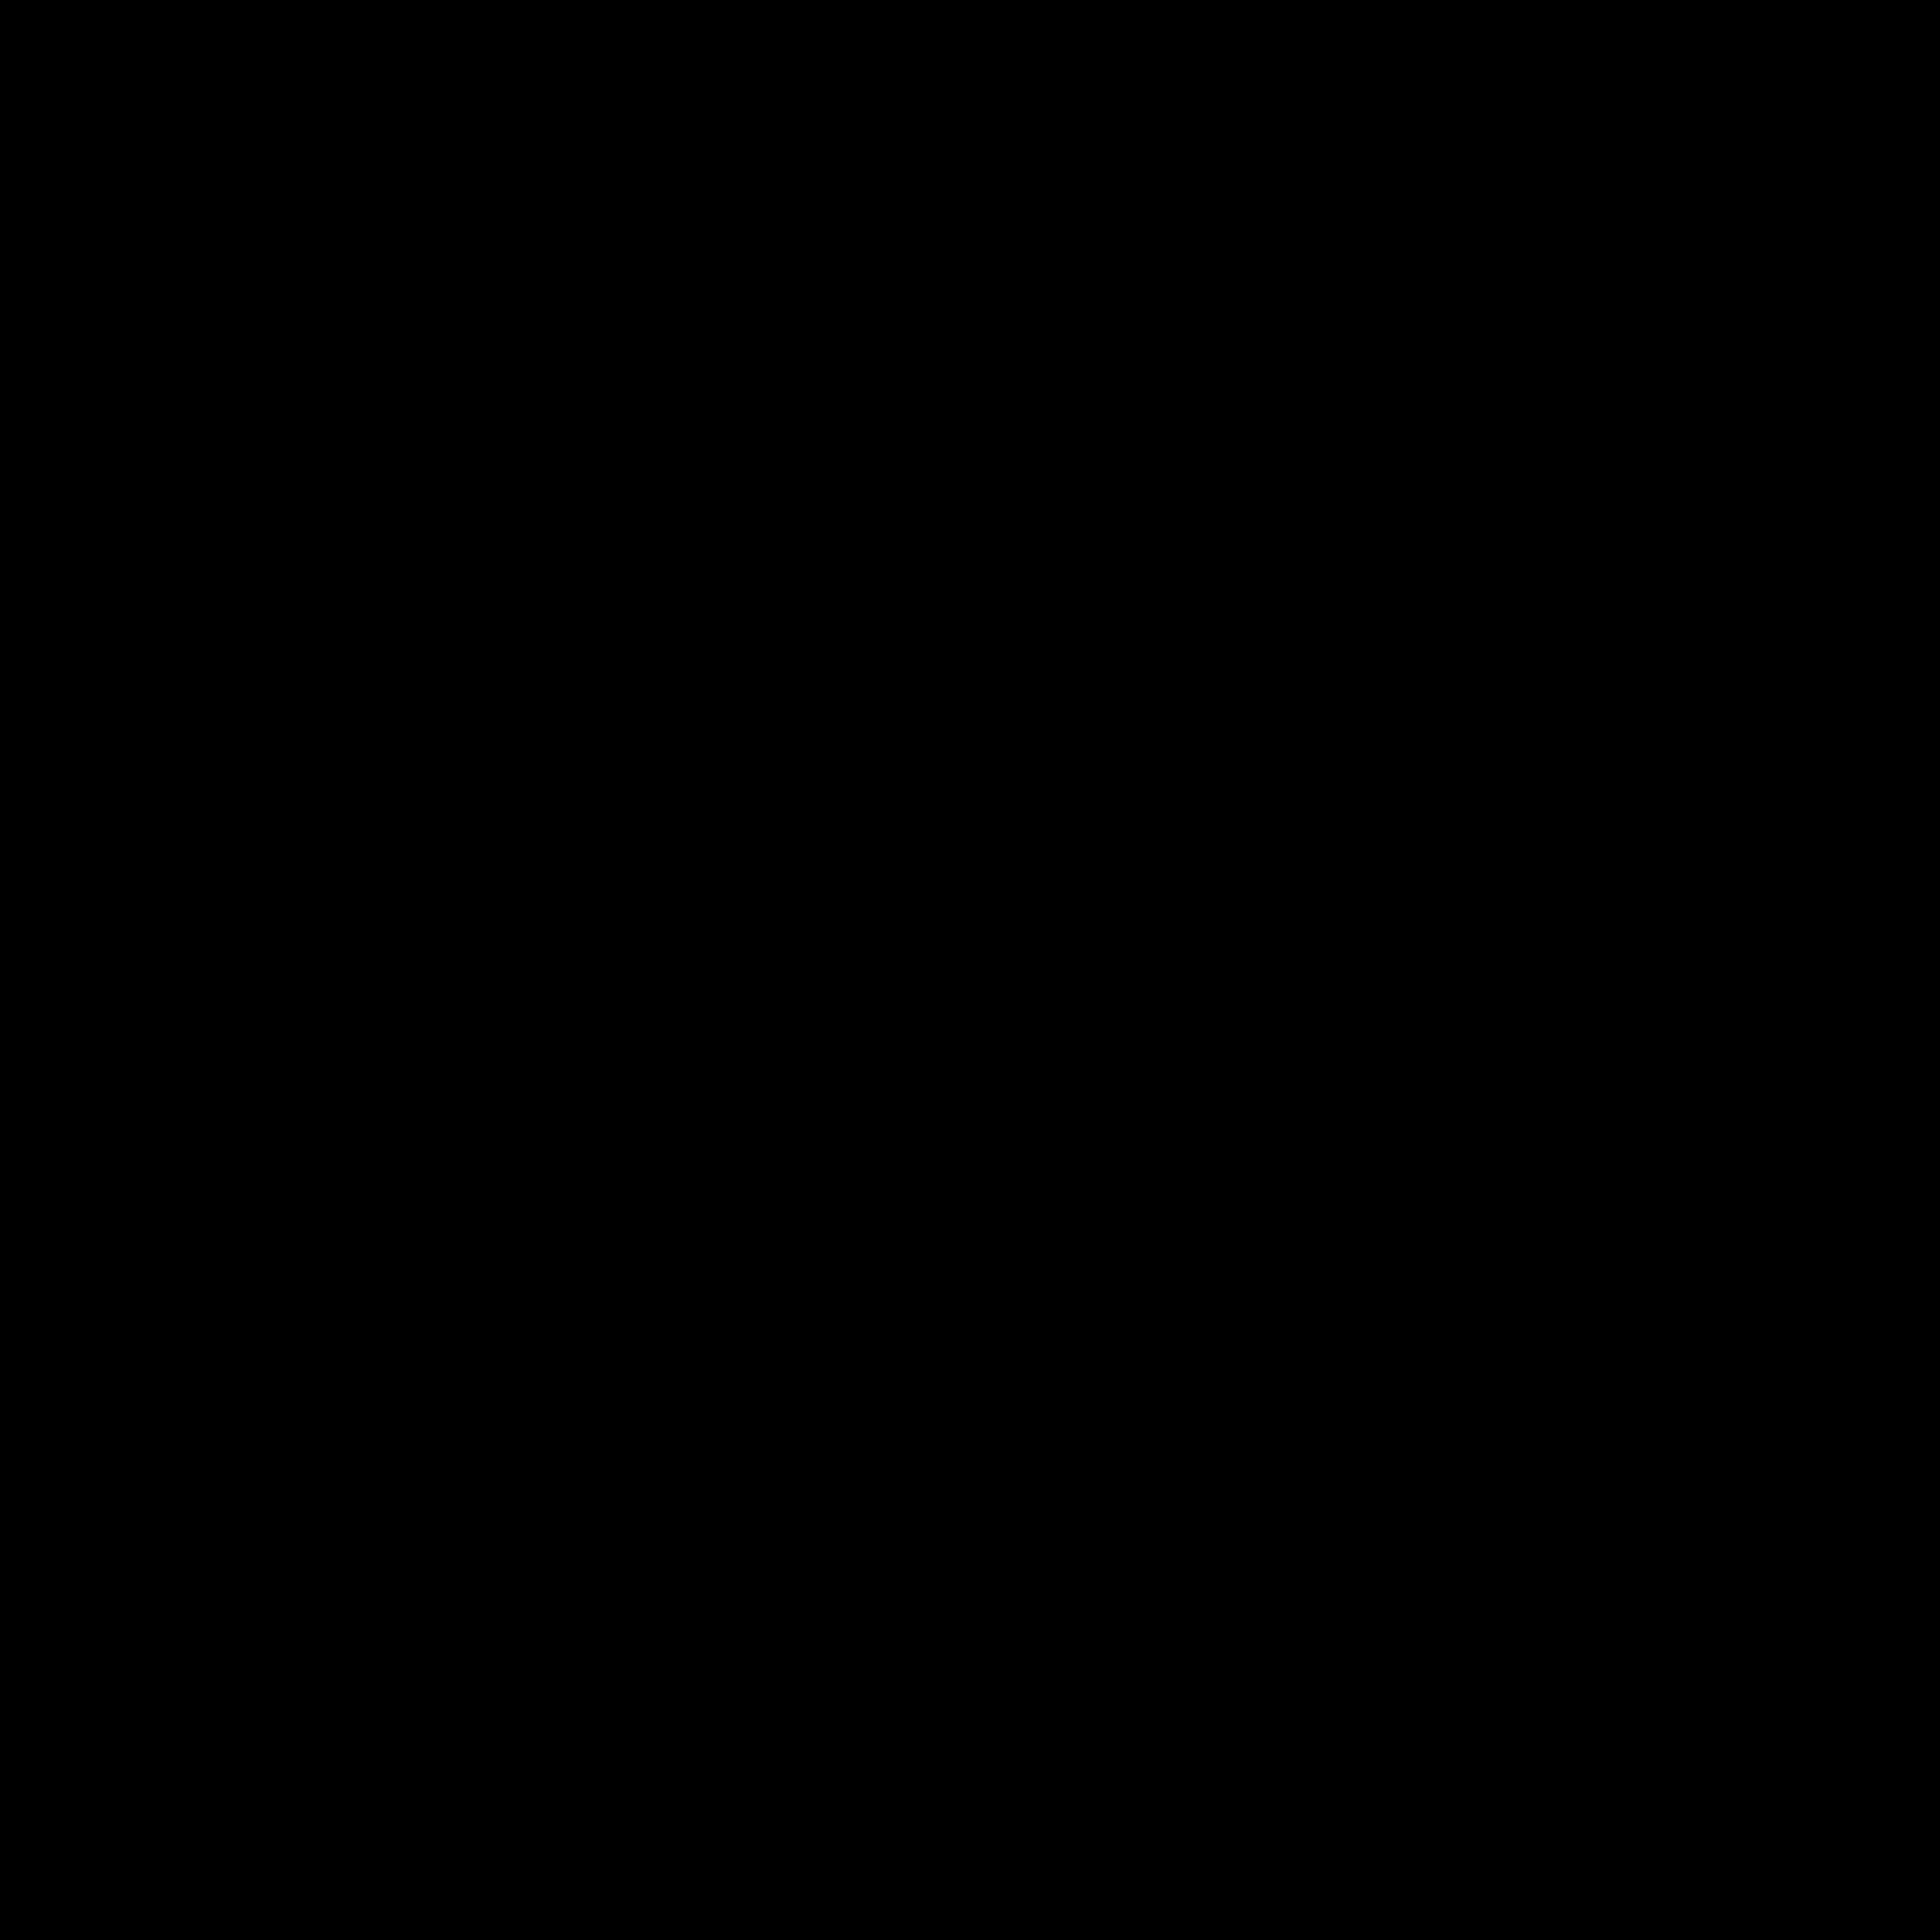 Clipart arrows frame. Big image png